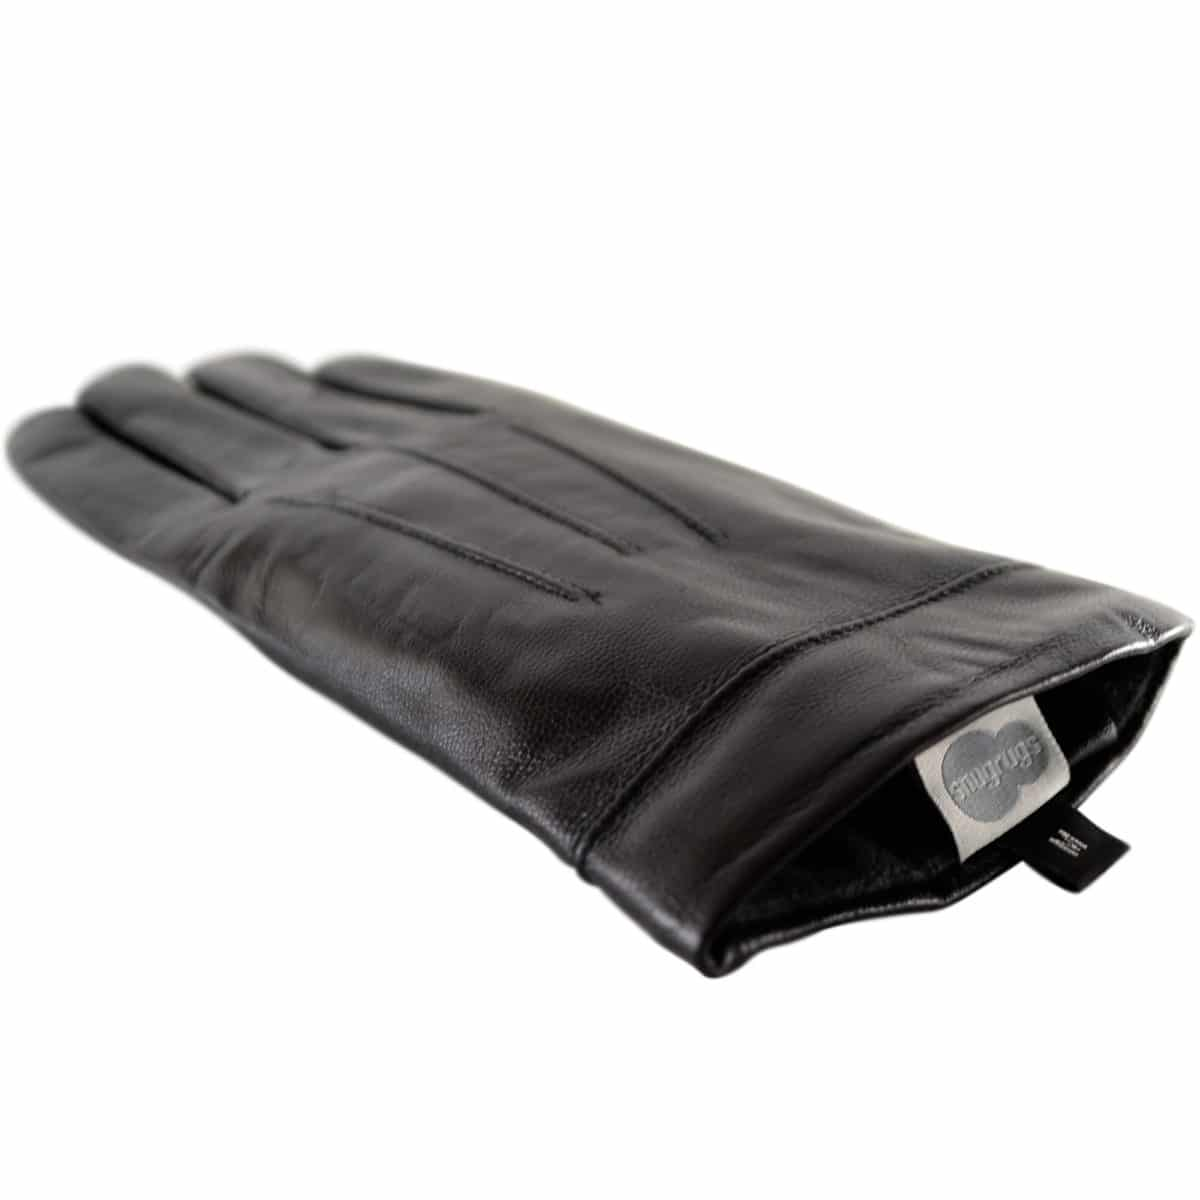 Mavis - Leather Gloves Three Point Stitch - Black